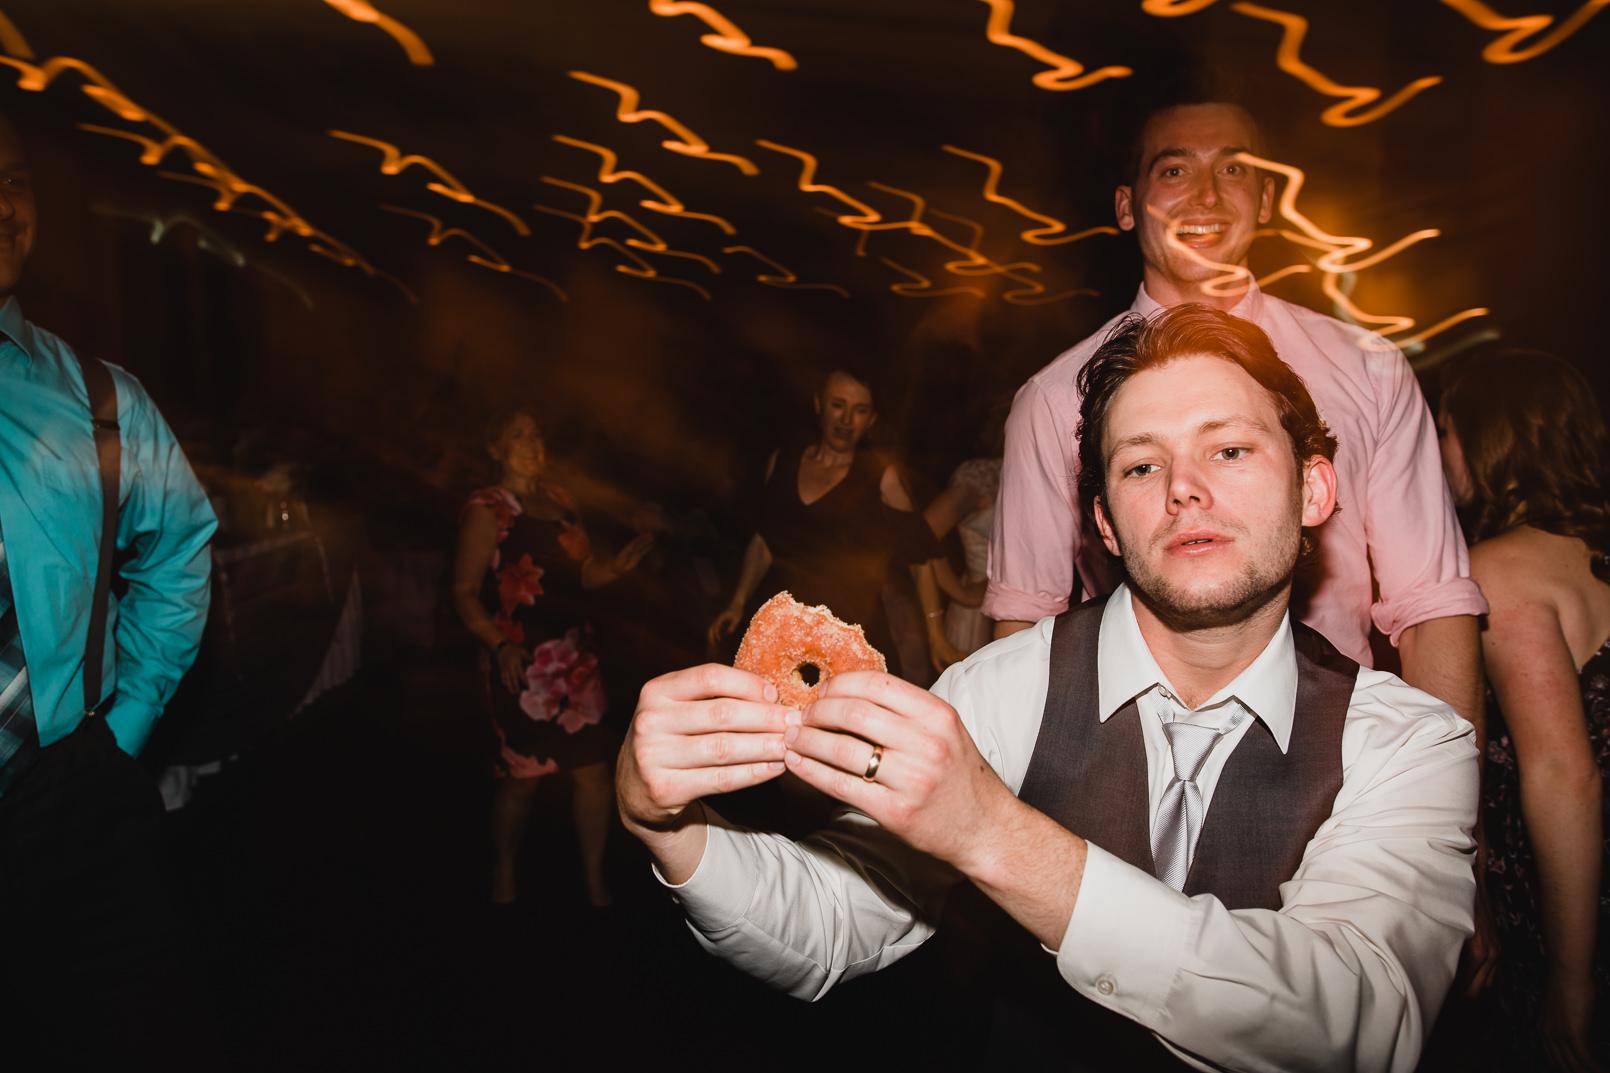 014-Jonathan-Kuhn-Photography-Wedding-_mini.jpg